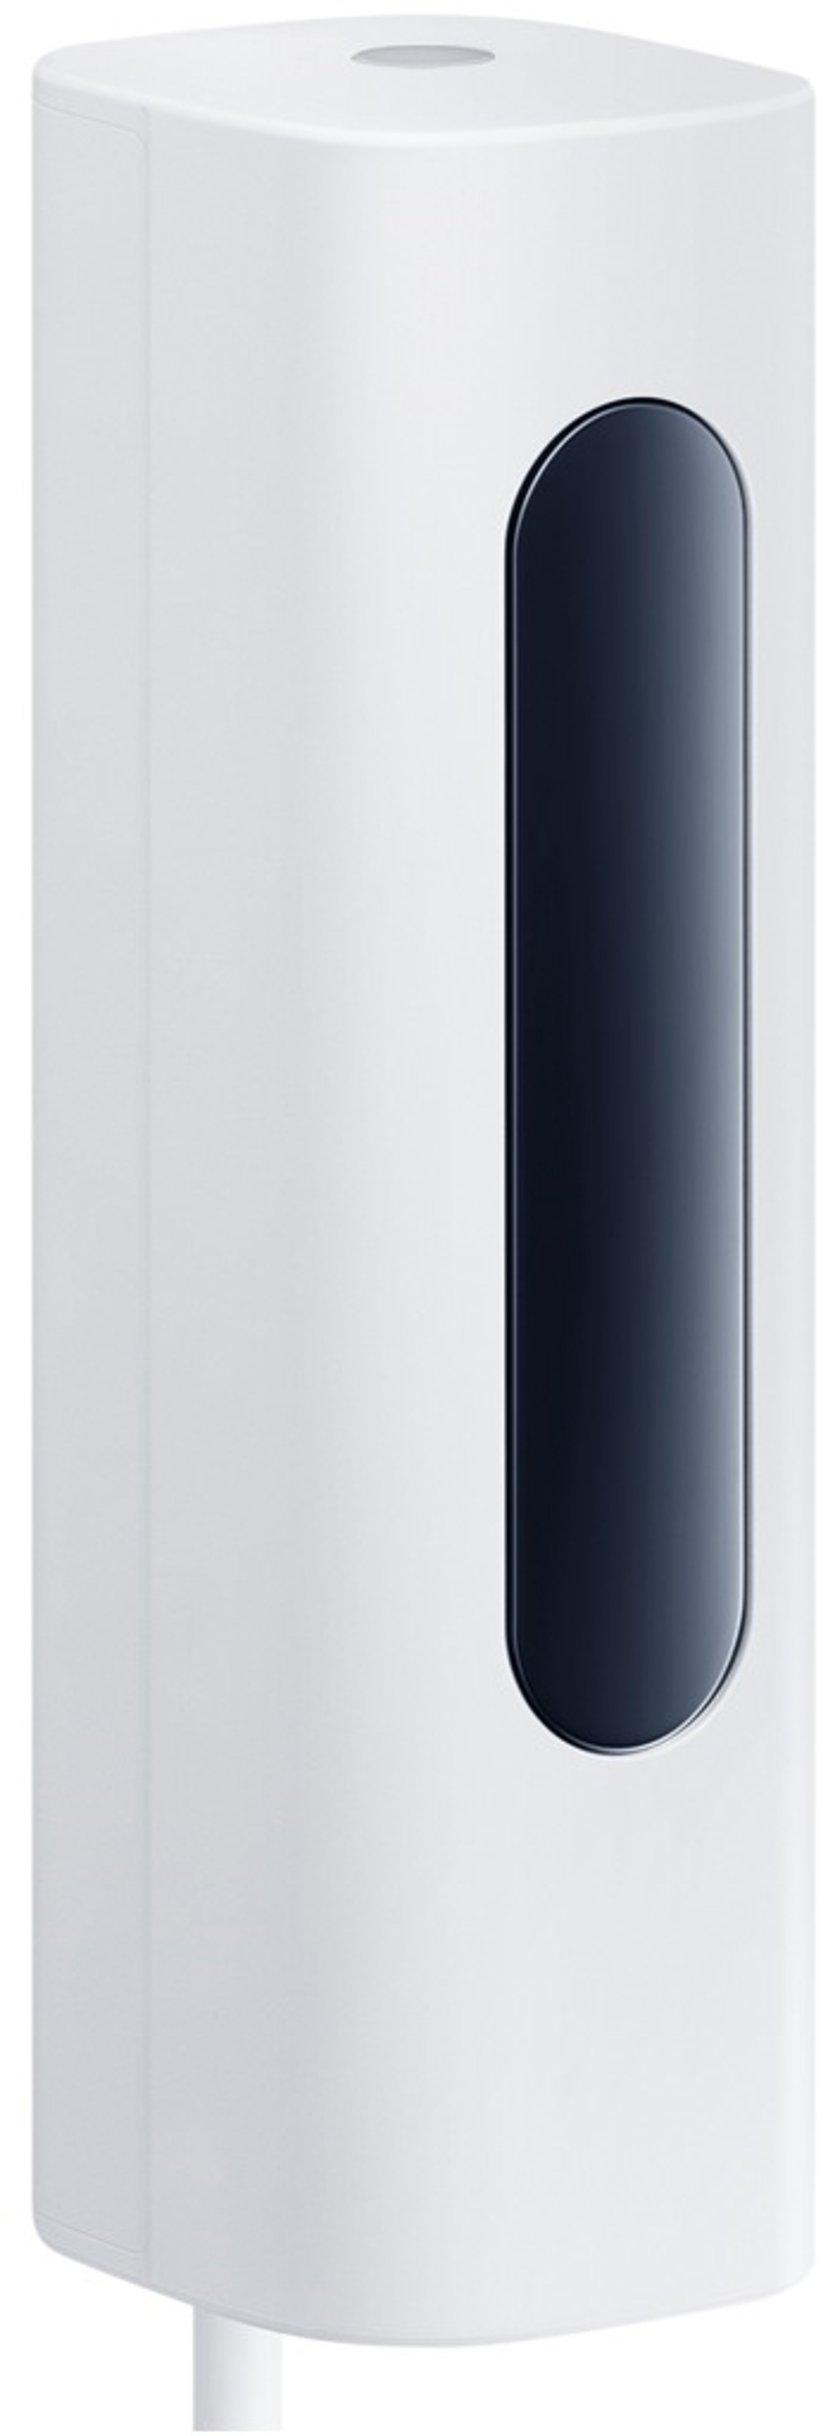 Samsung Samsung SmartThings vision